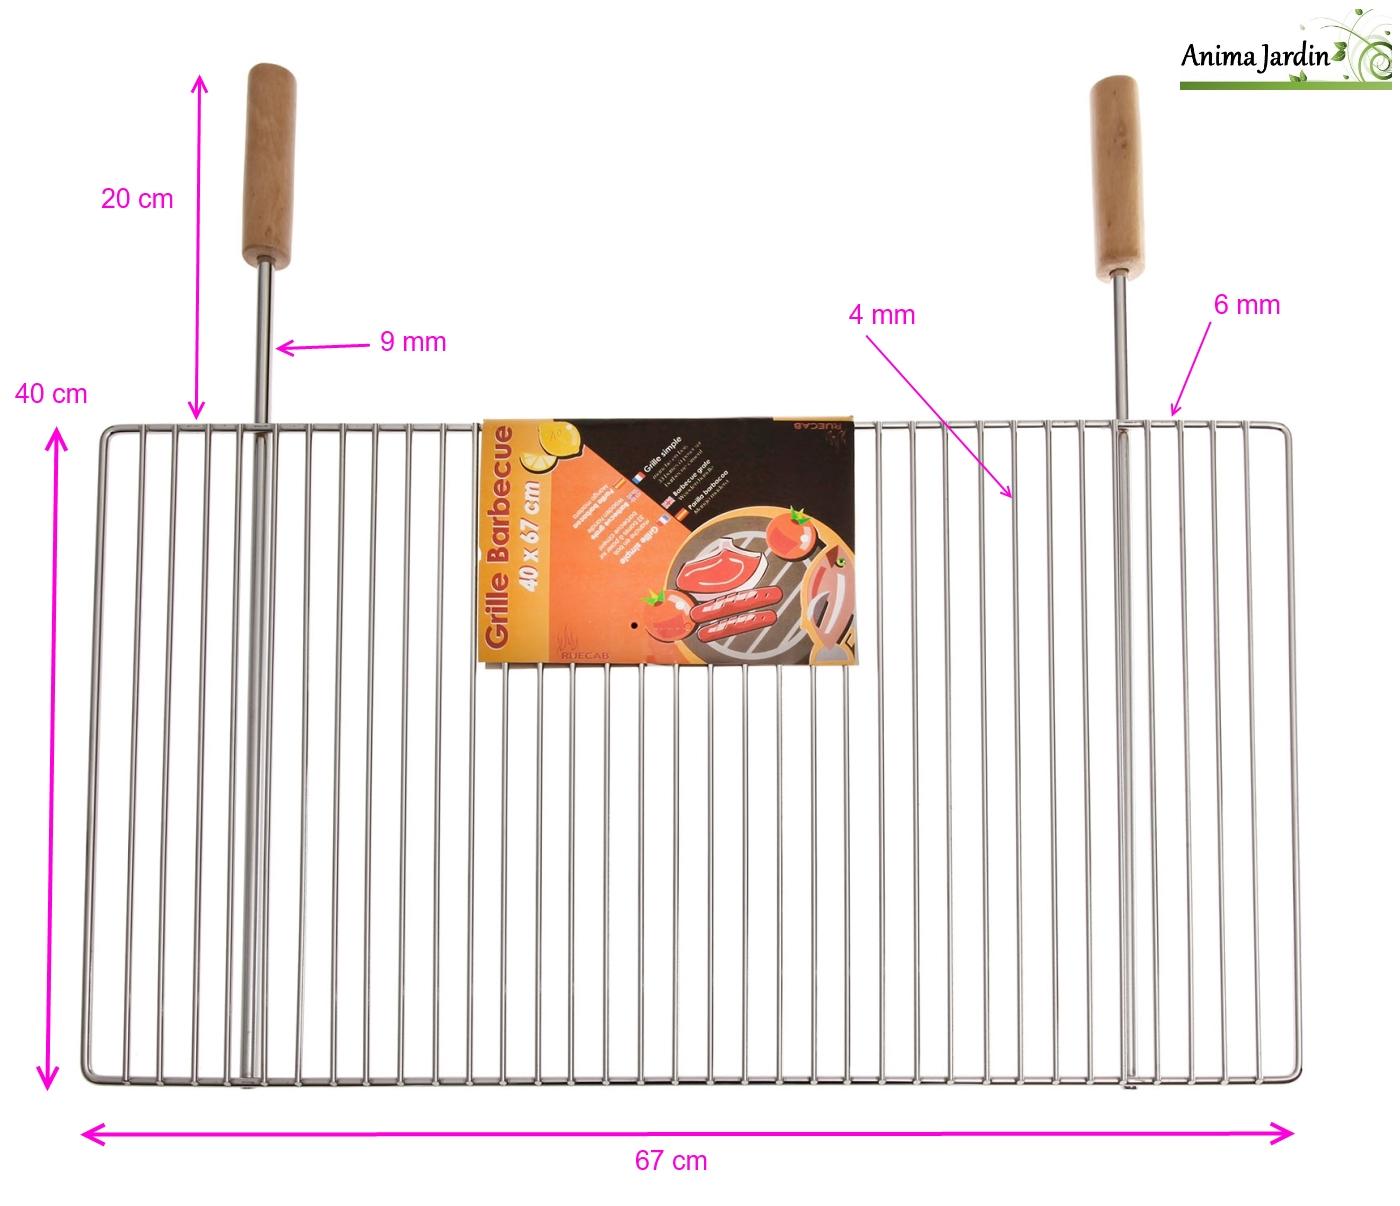 grande-grille-67x40cm-barbecue-cheminée-anima-jardin.fr